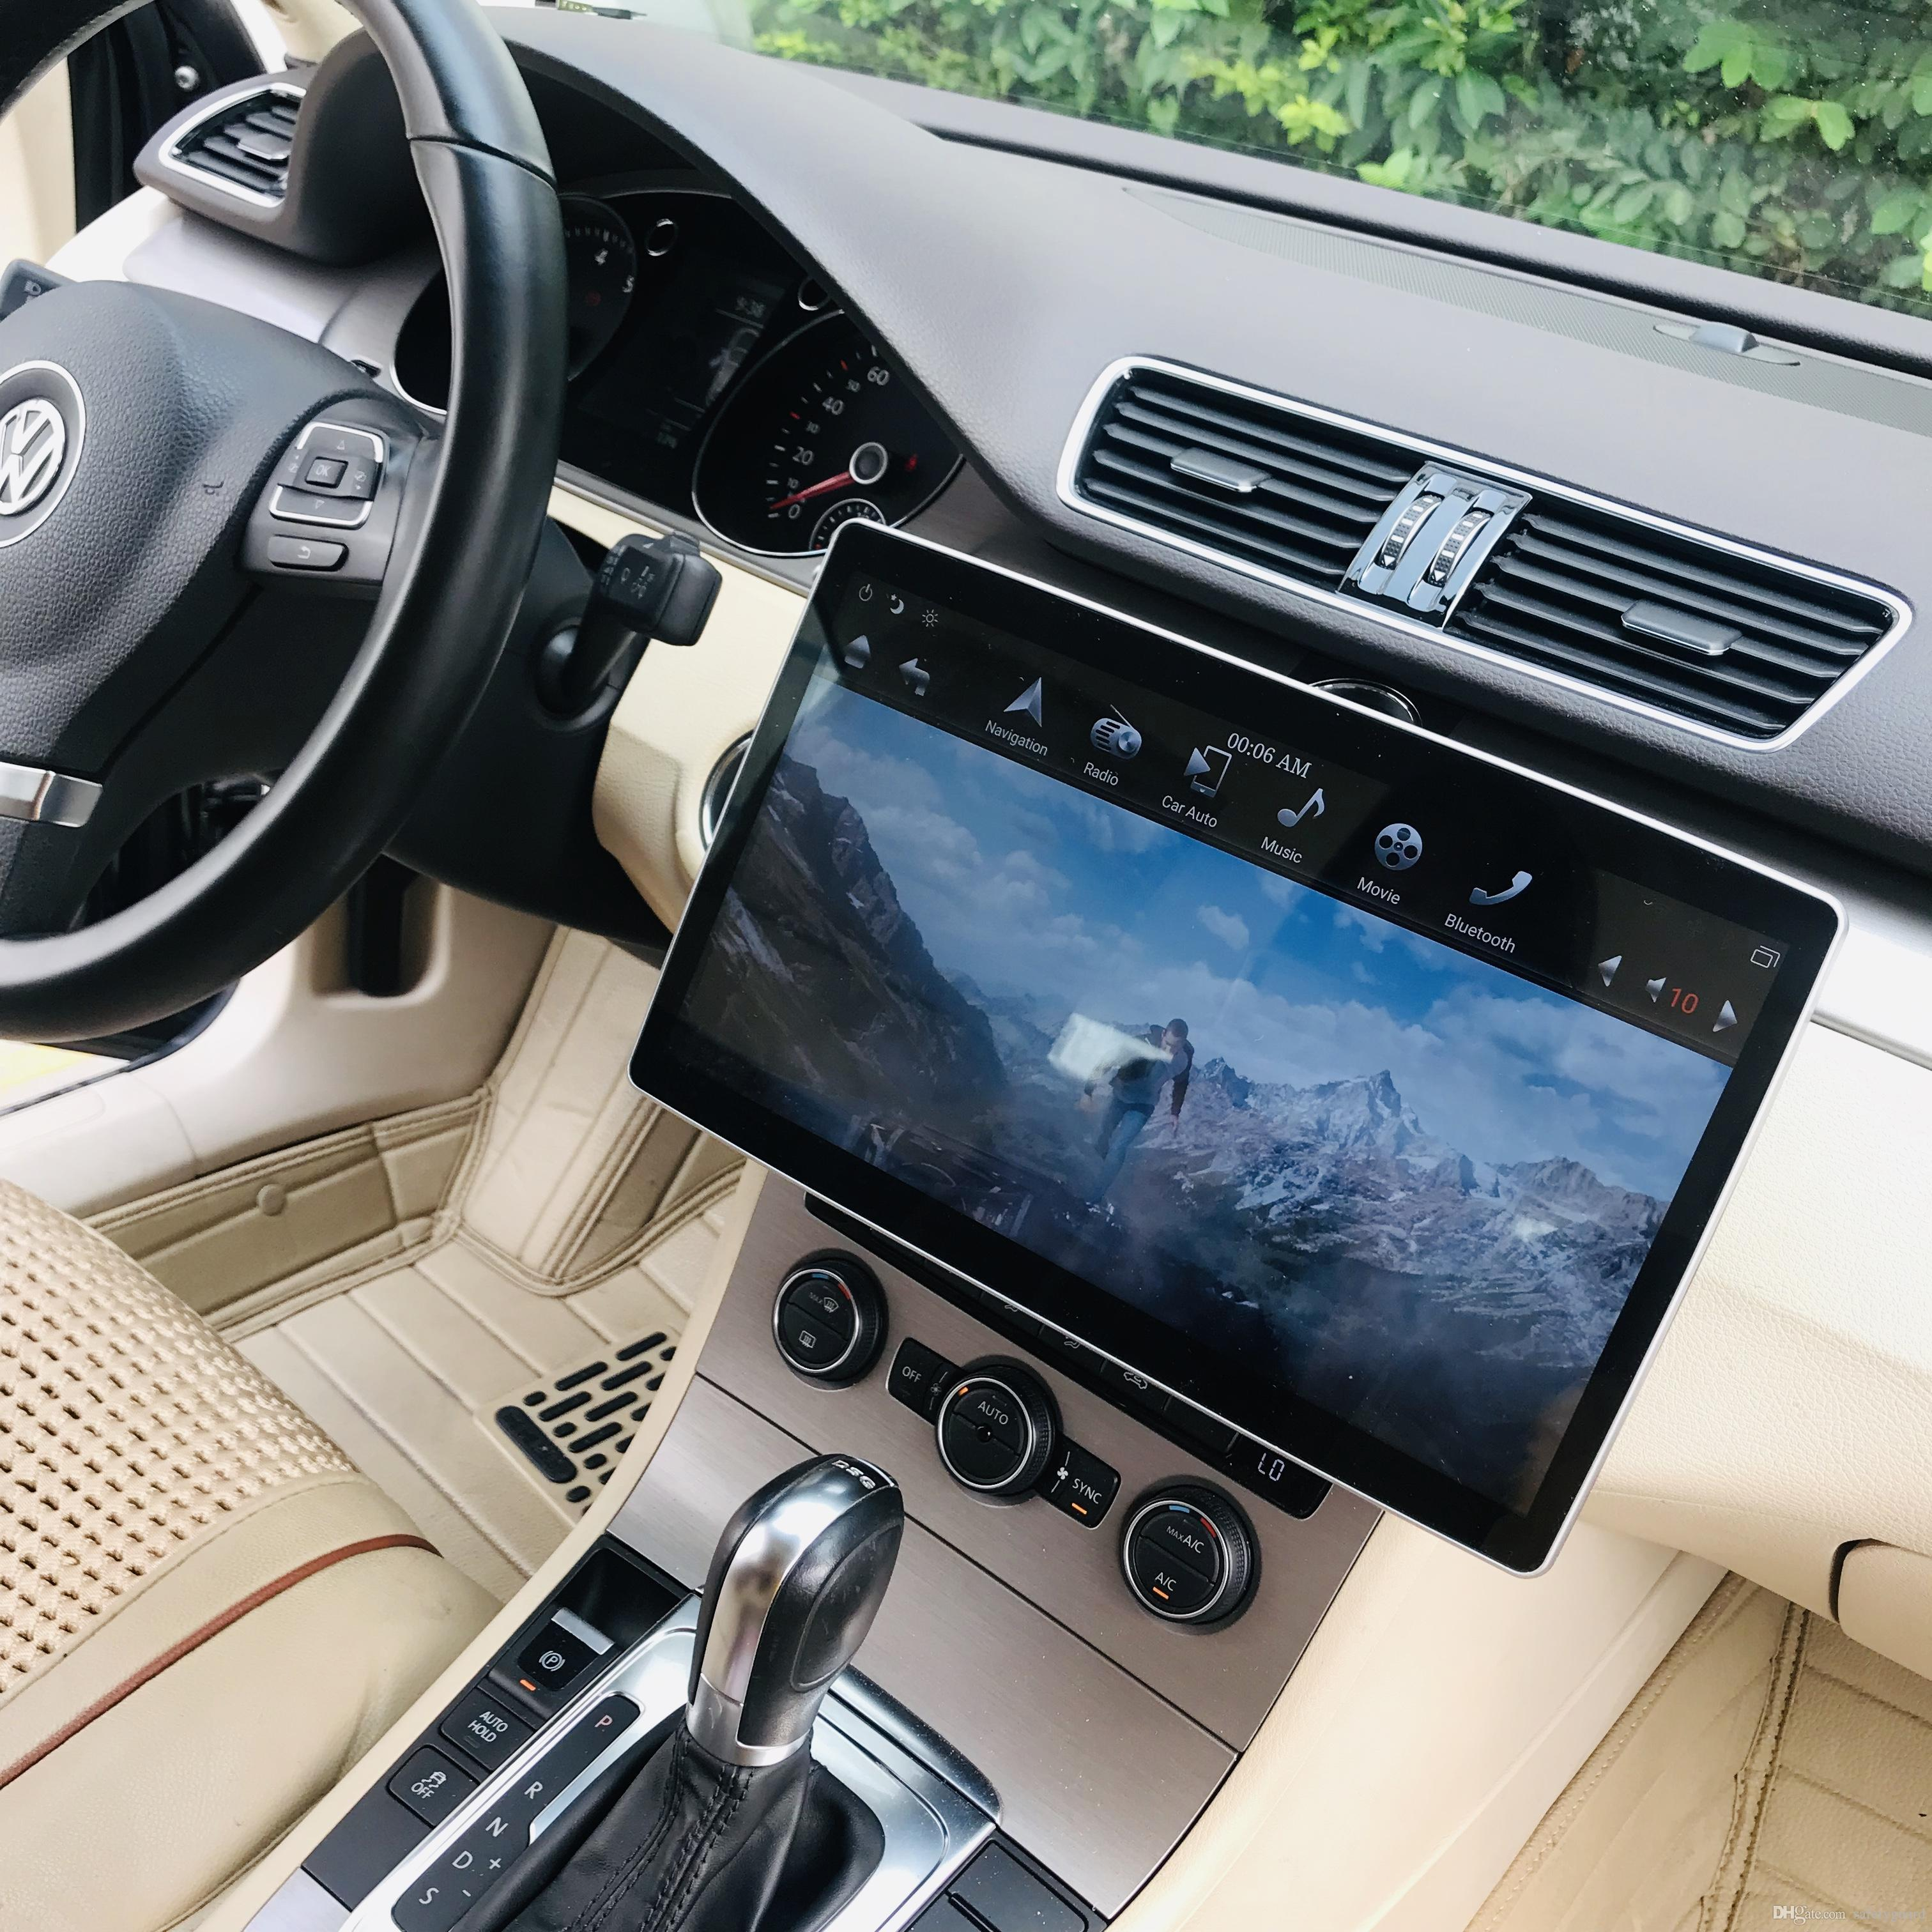 IPS للتدوير 2 الدين 12.8 6 النواة PX6 الروبوت 8.1 العالمي سيارة دي في دي لاعب راديو GPS بلوتوث WIFI من السهل الاتصال IPS تدوير الشاشة